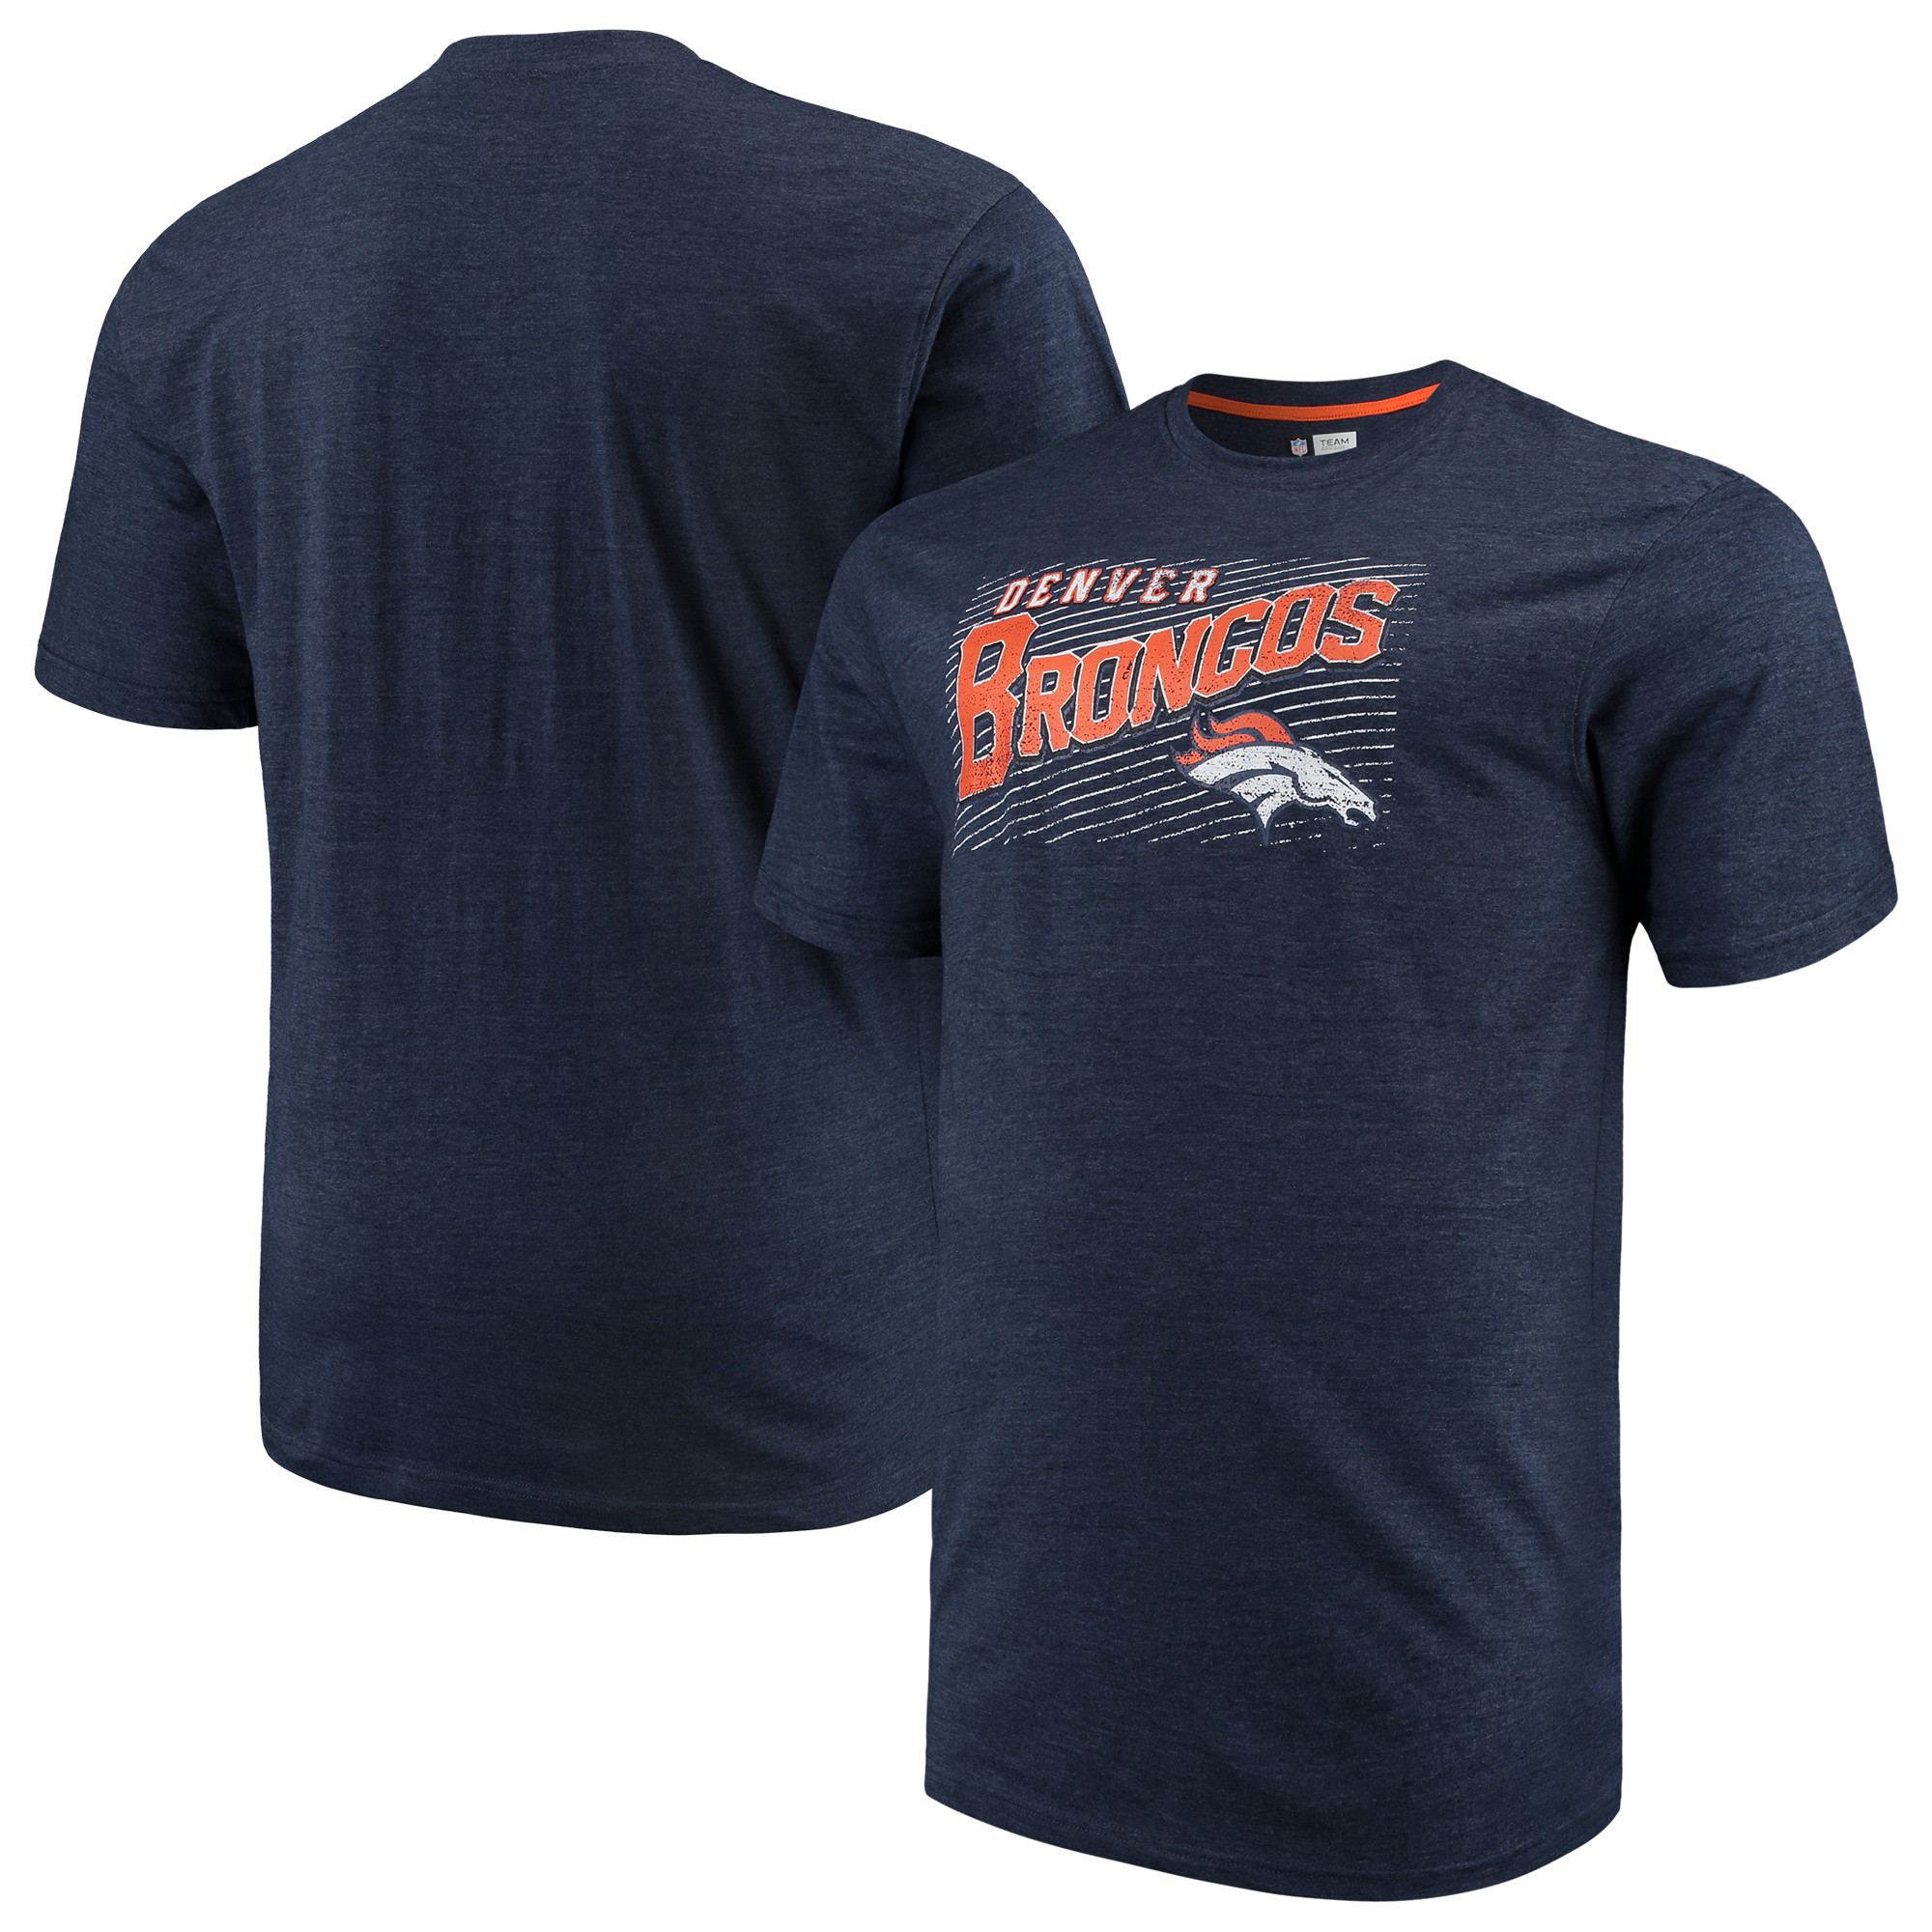 Men's Majestic Navy Denver Broncos Big & Tall Royal Domination Malt T-Shirt